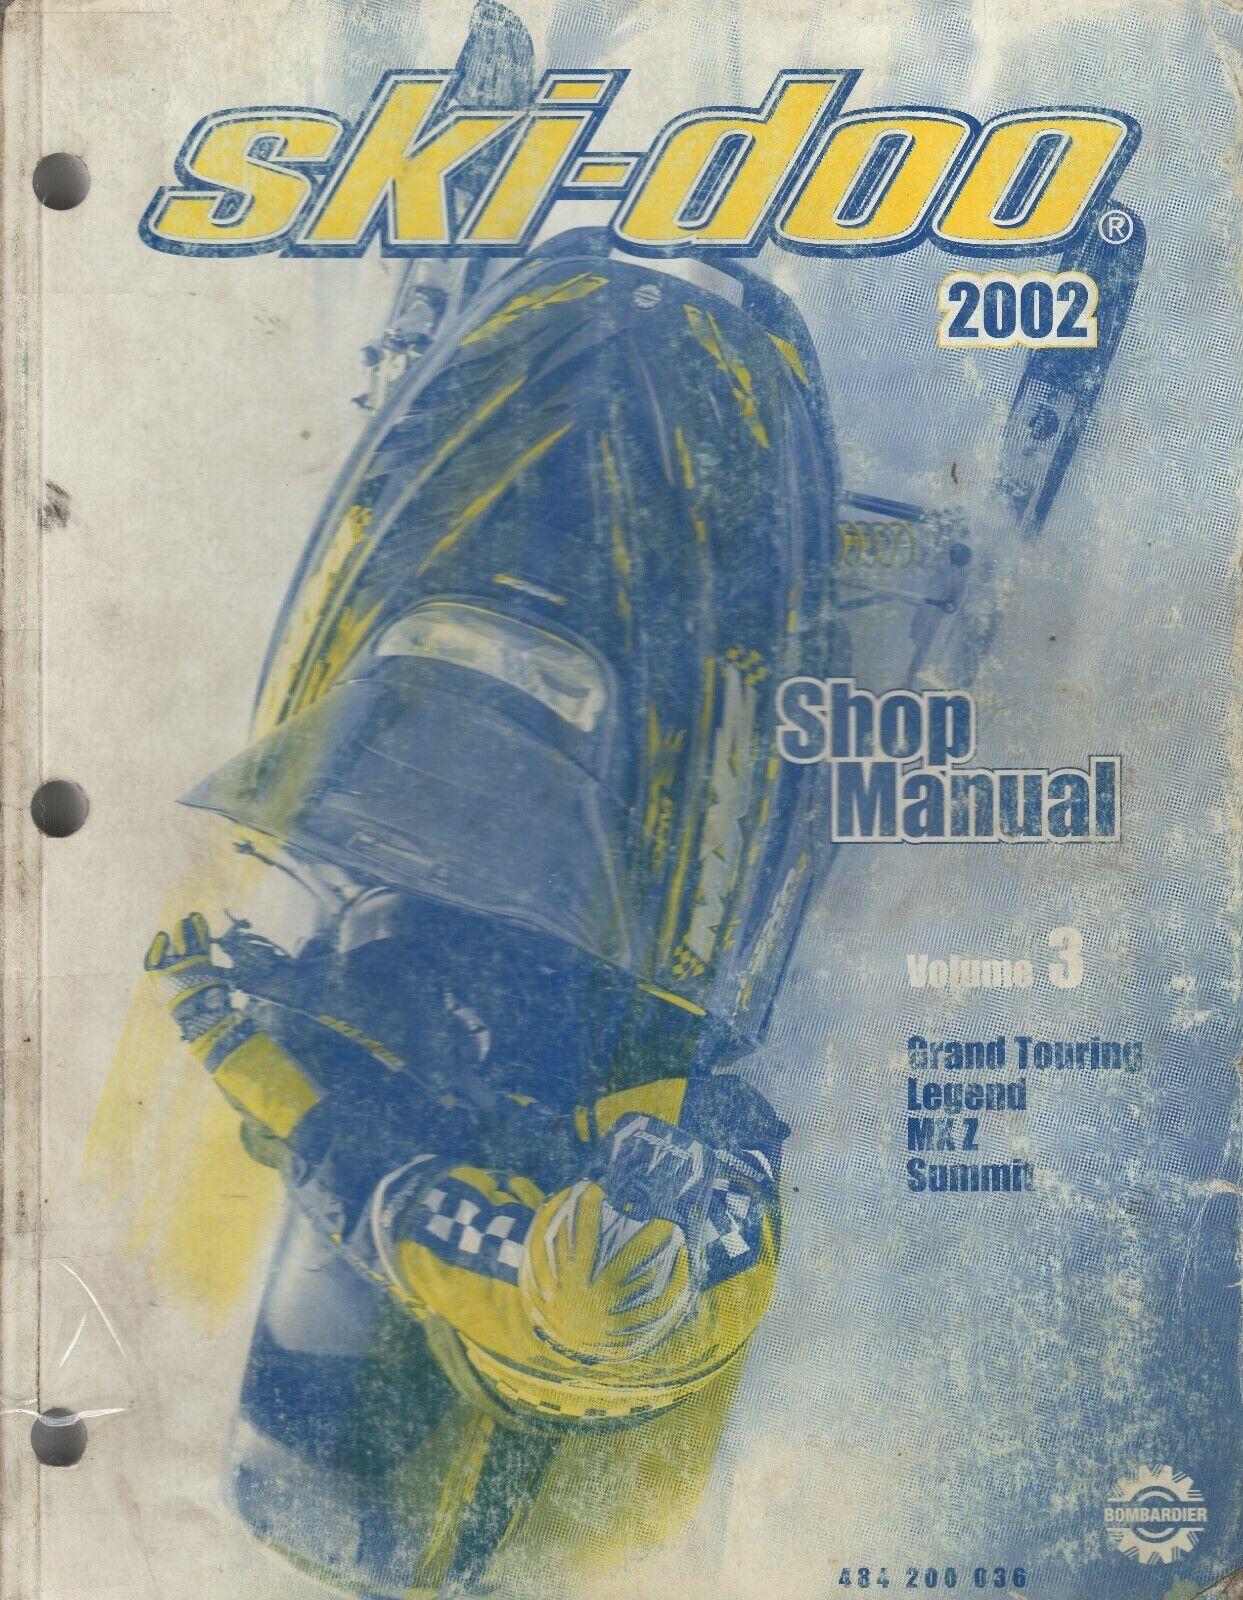 2002 SKI-DOO SNOWMOBILE VOLUME 3, (SEE COVER LIST) SHOP MANUAL 484 200 036 (613)